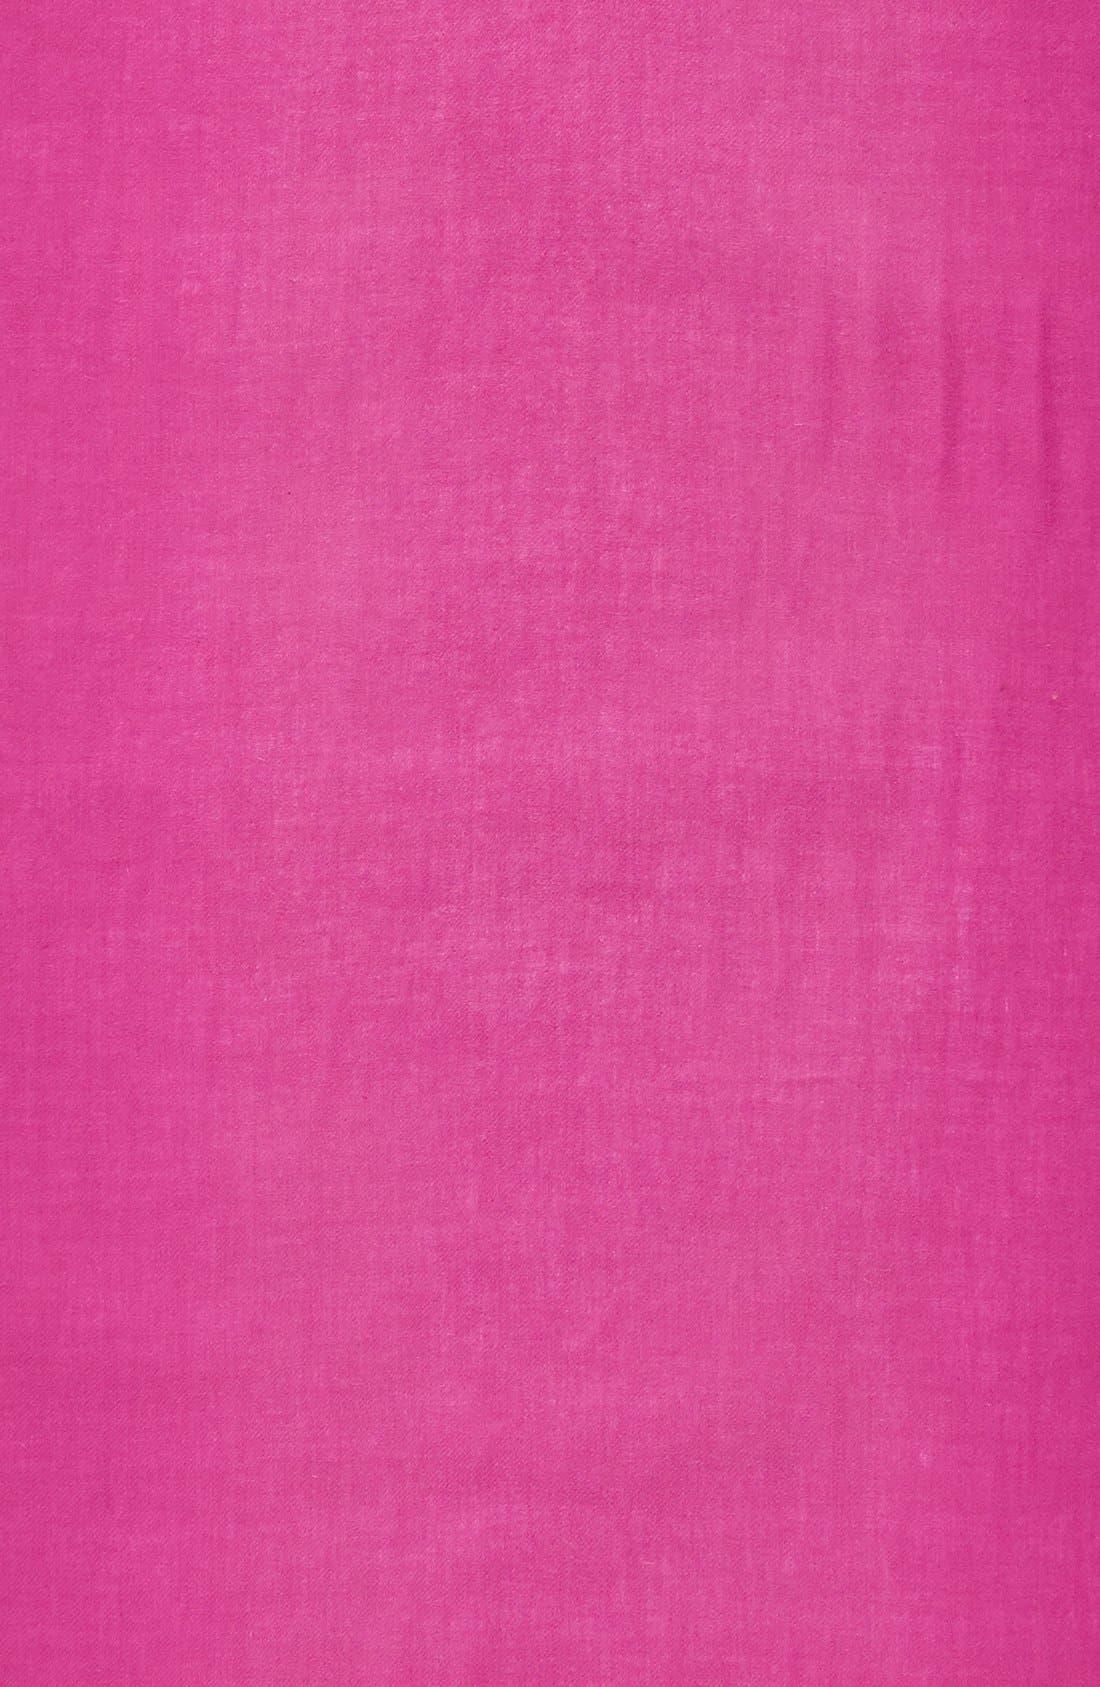 Wool & Cashmere Wrap,                             Alternate thumbnail 37, color,